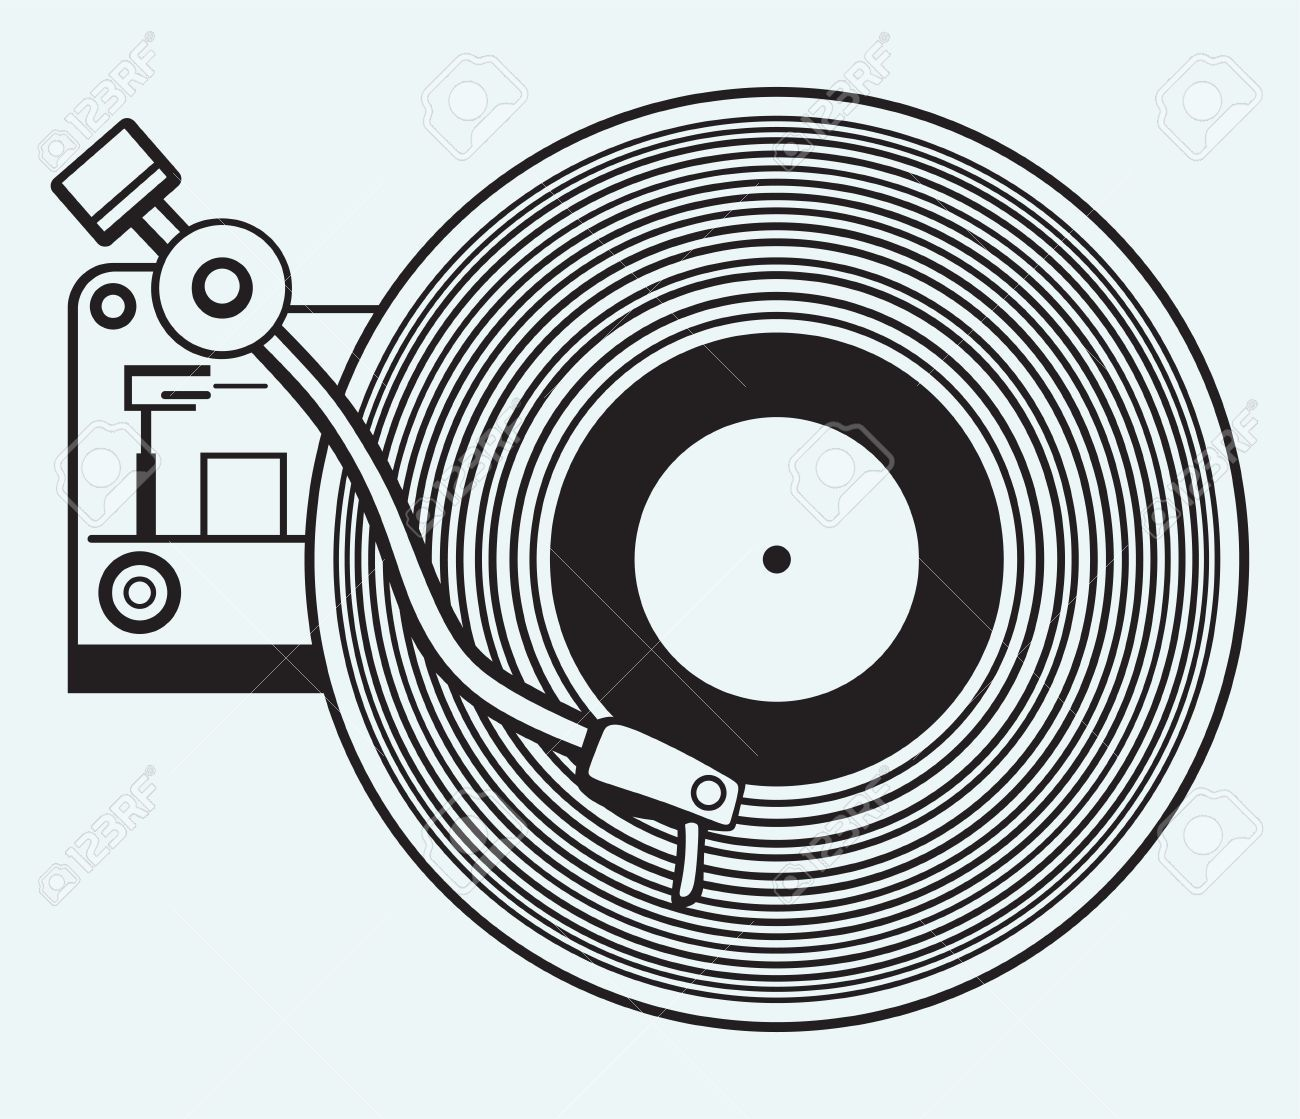 record player silhouette Google Search Vinyl record